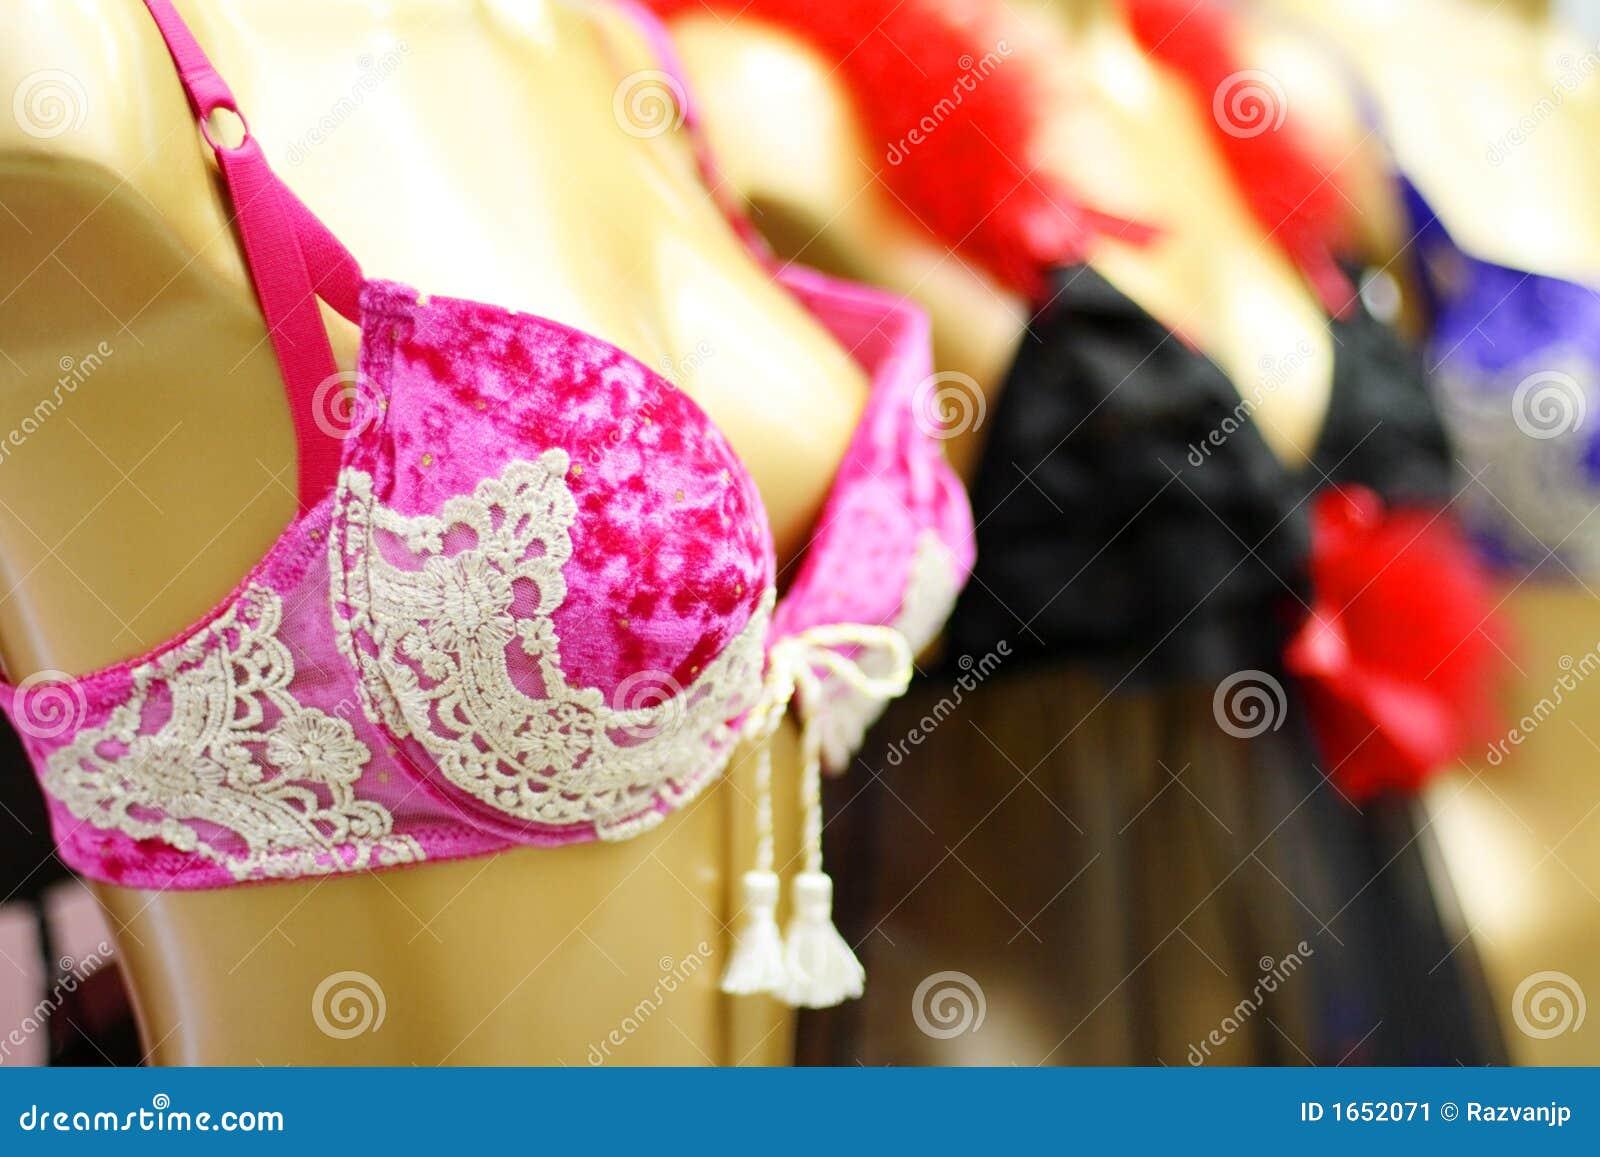 Lingerie Shop Stock Image - Image: 1652071